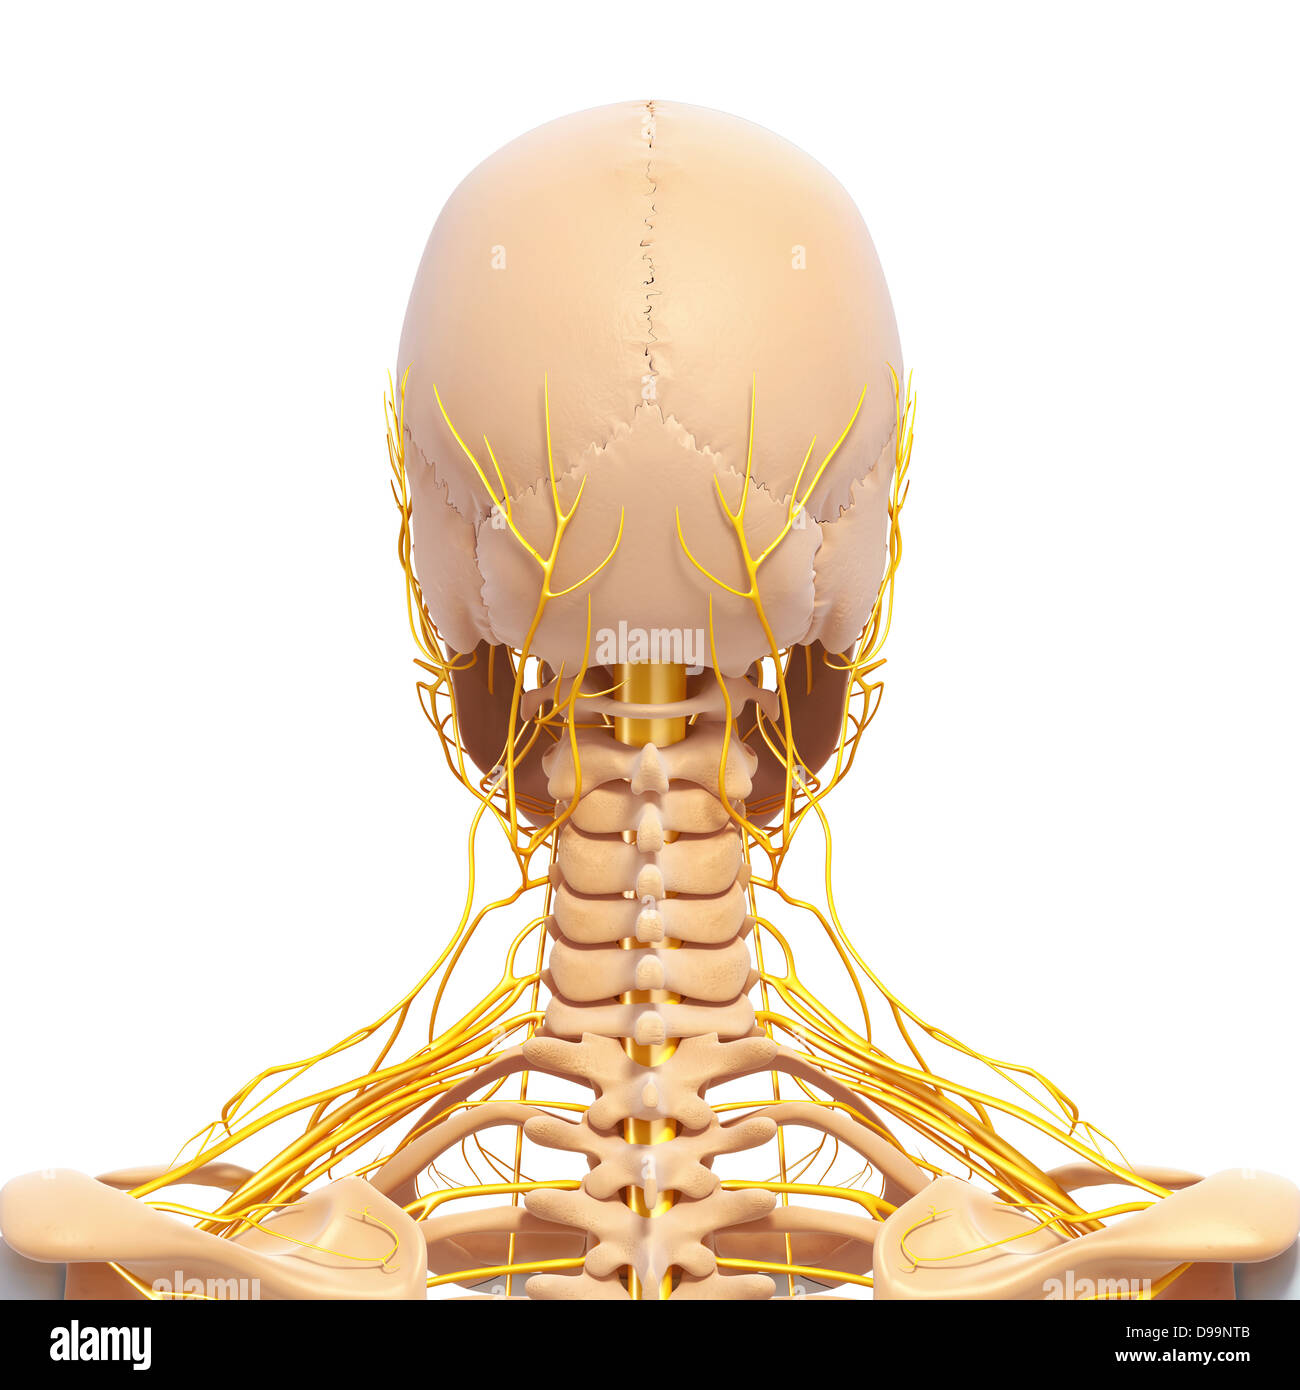 Human Head Anatomy With Nervous System Stock Photo 57377723 Alamy